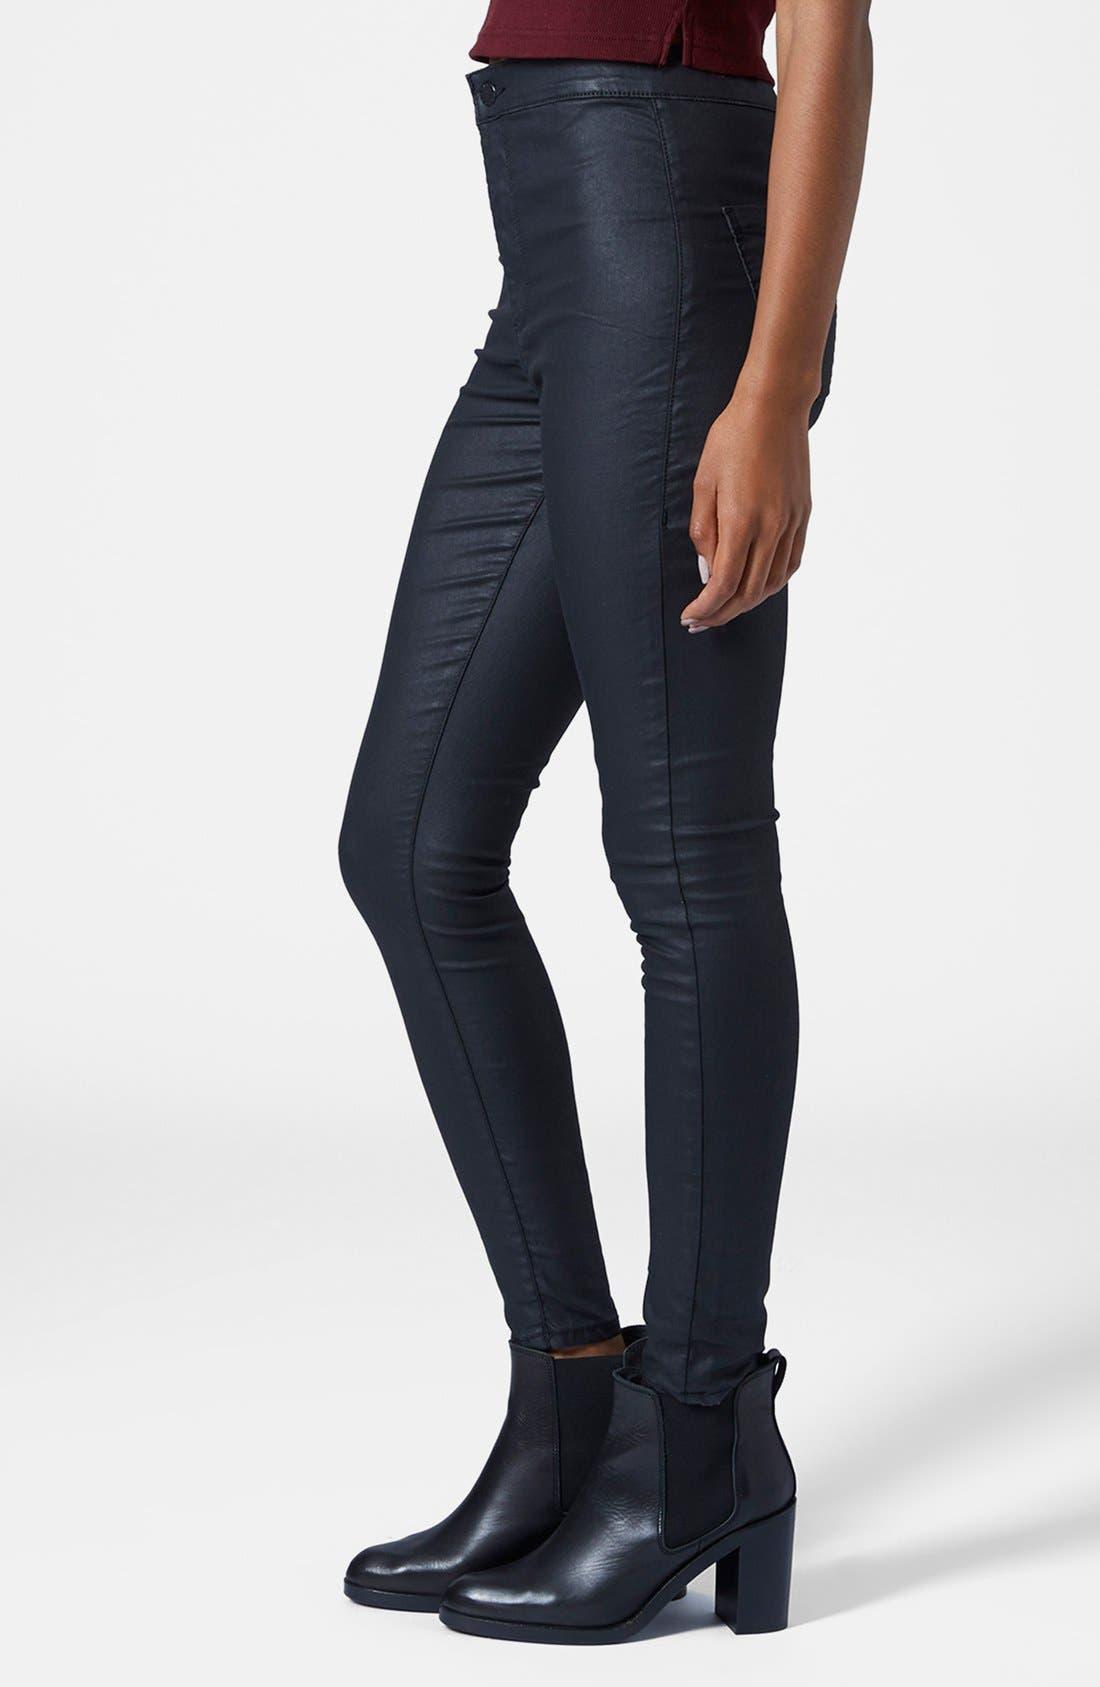 Main Image - Topshop Moto 'Joni' Coated Skinny Jeans (Black)